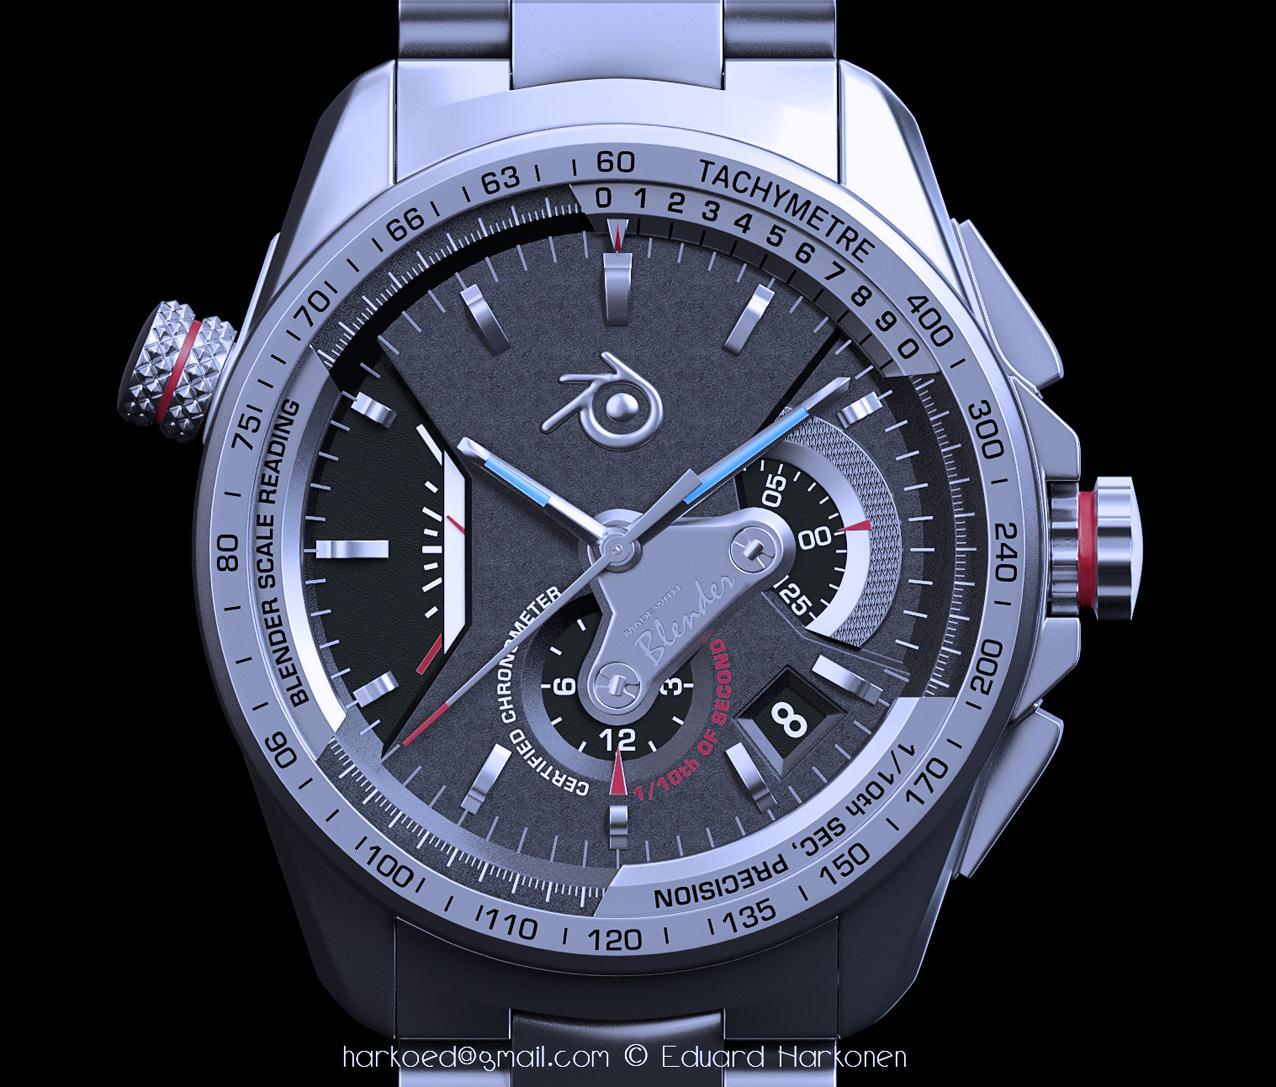 watch_front.jpg